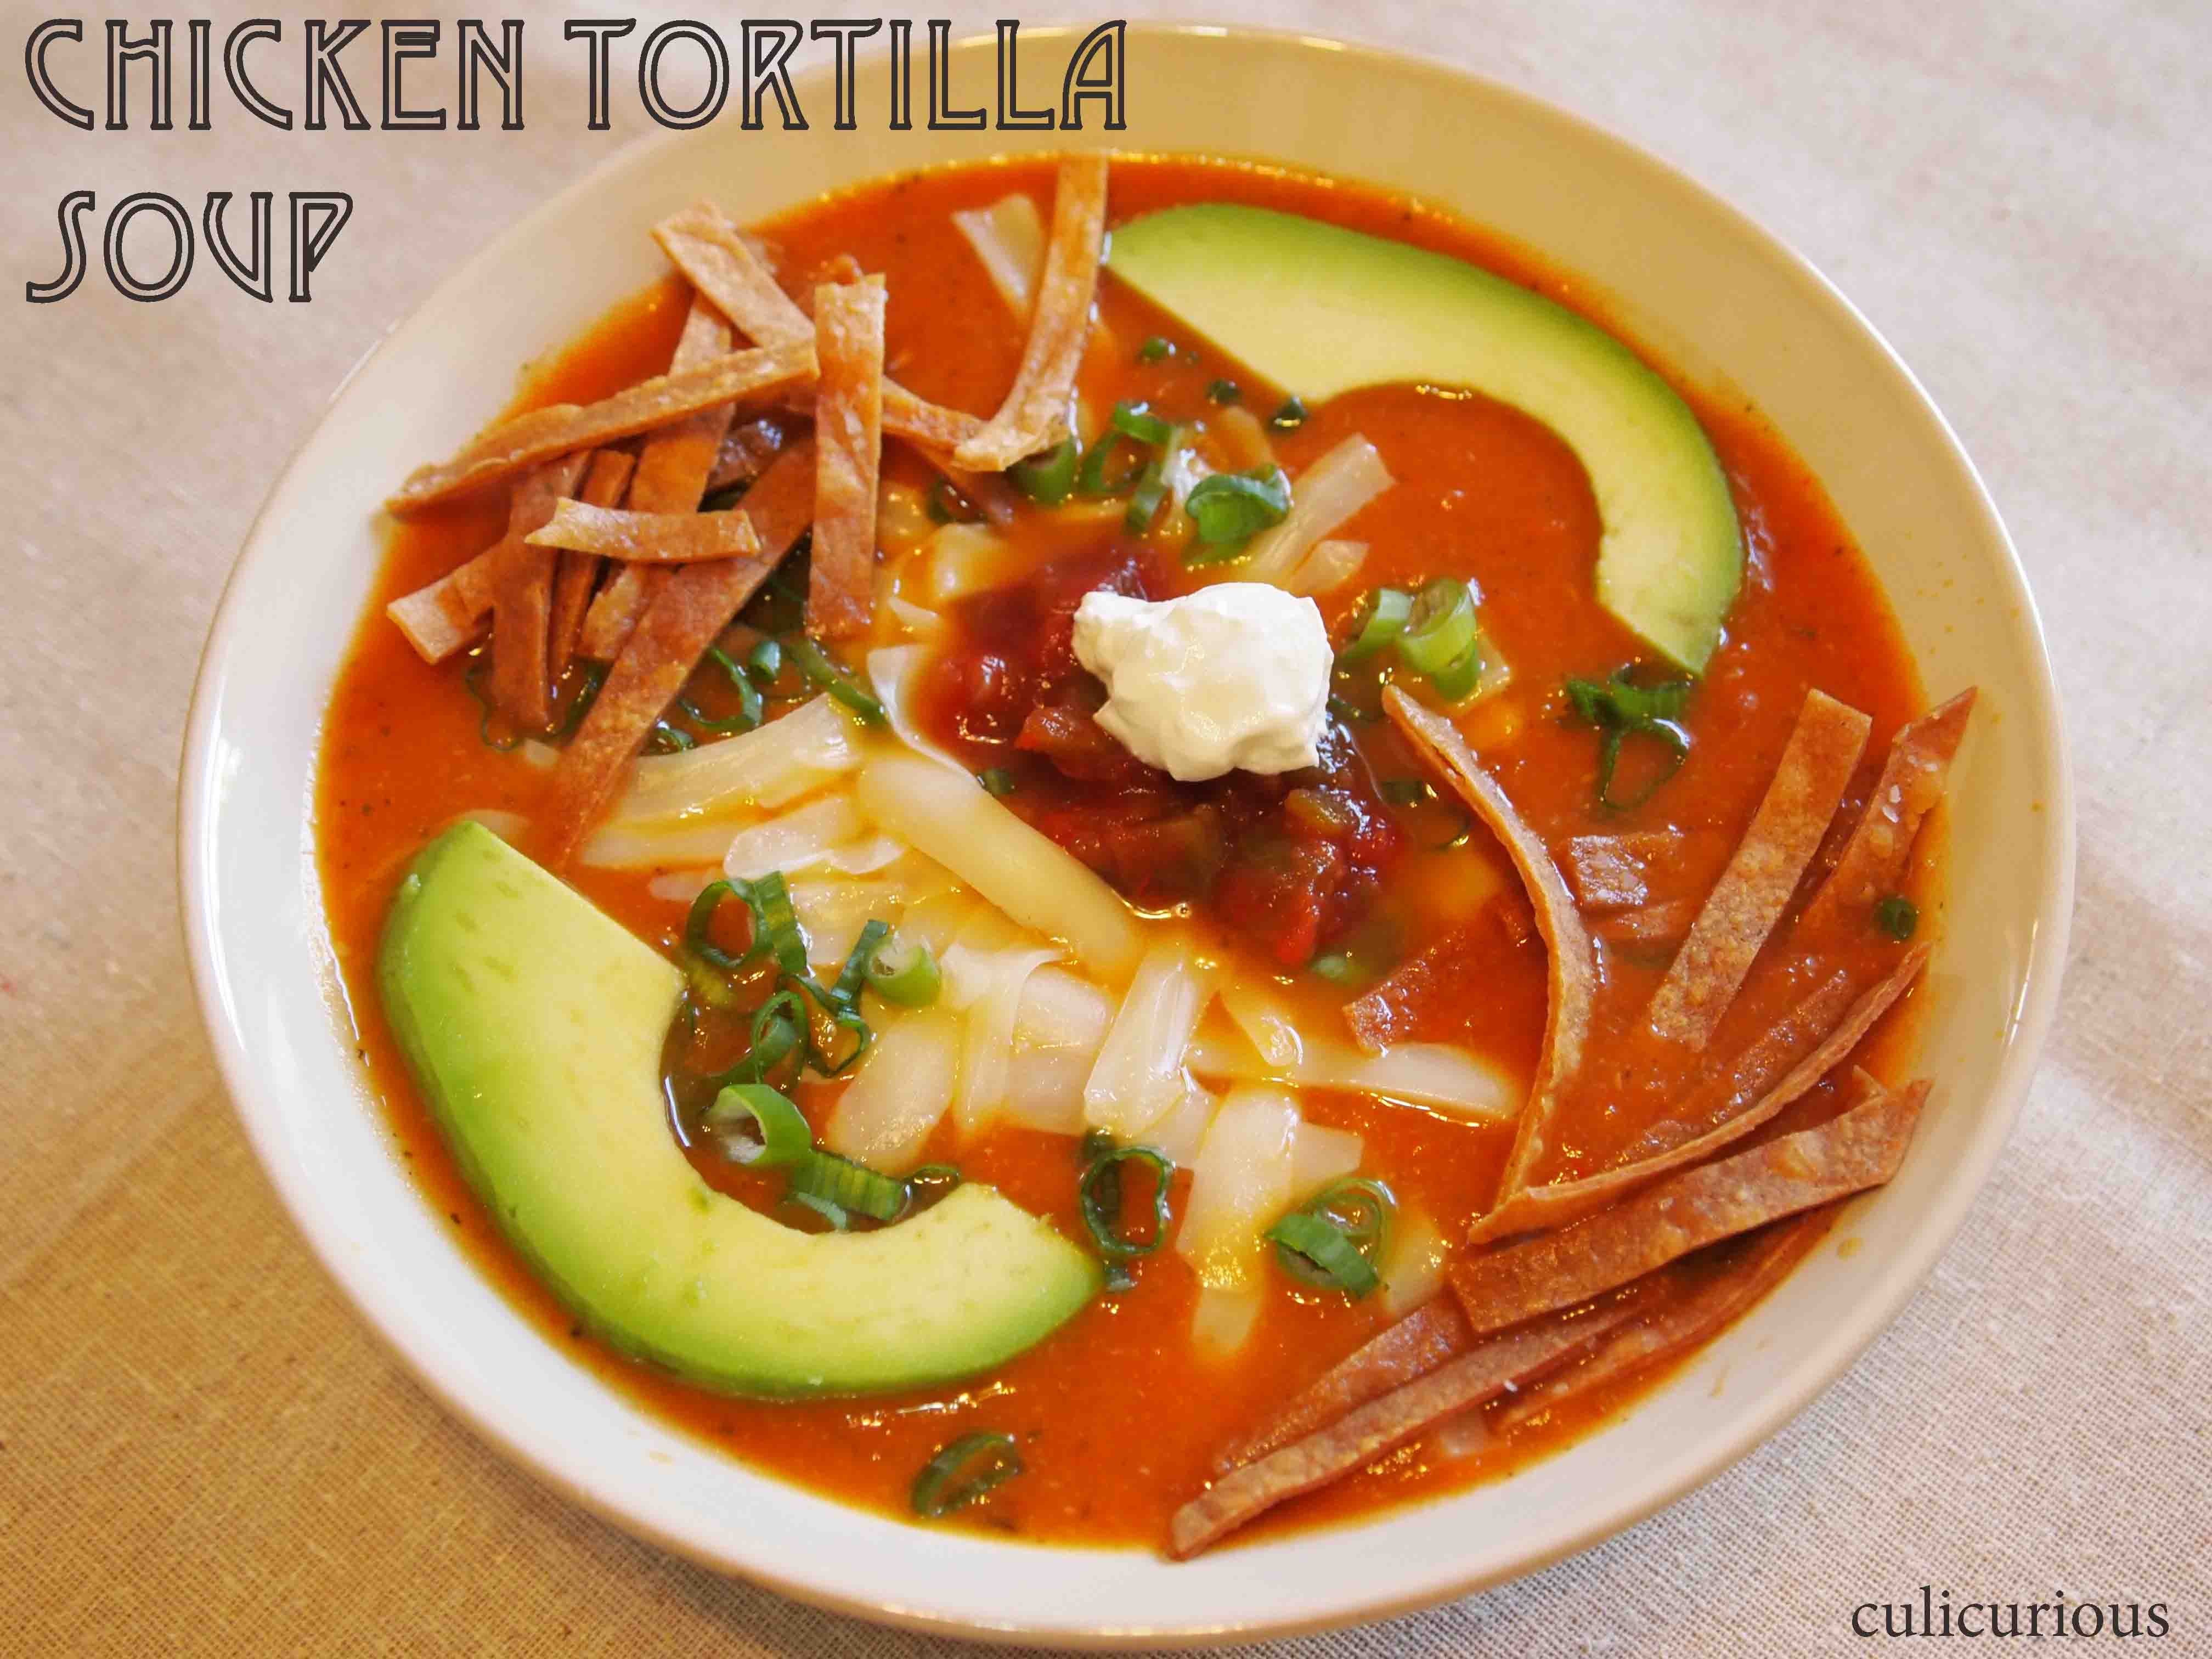 Recipe For Chicken Tortilla Soup  Chicken Tortilla Soup Recipe culicurious